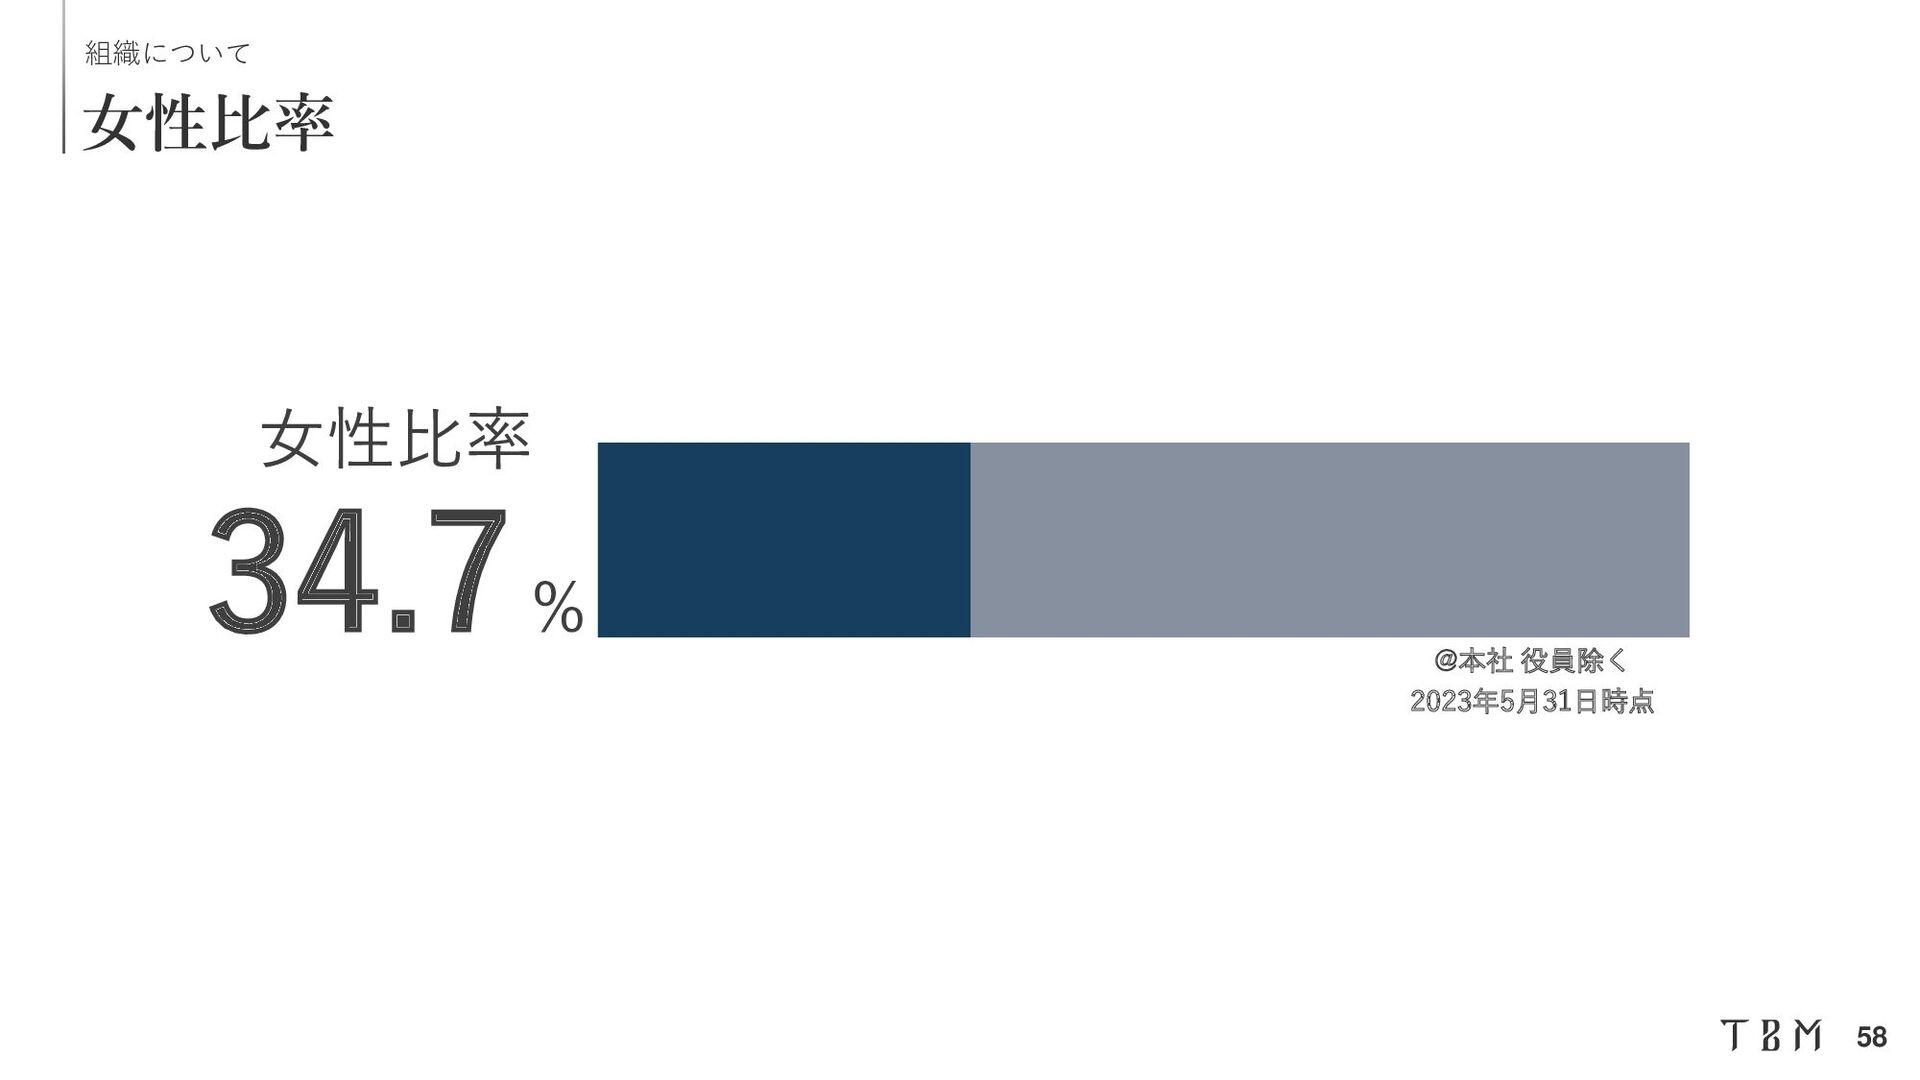 Confidential 自治体・プロスポーツクラブとの連携 TBM Co., Ltd. | ...